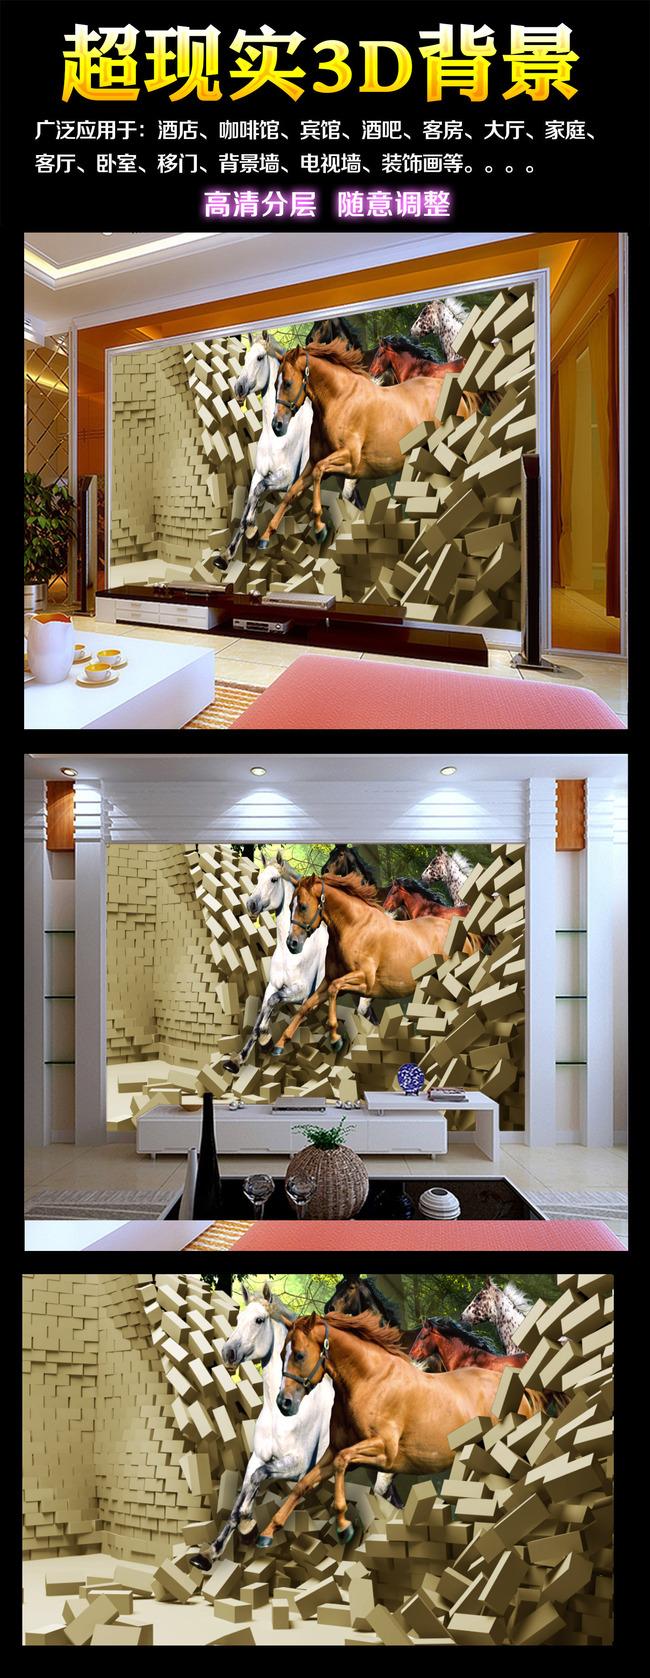 3d超现实电视背景墙